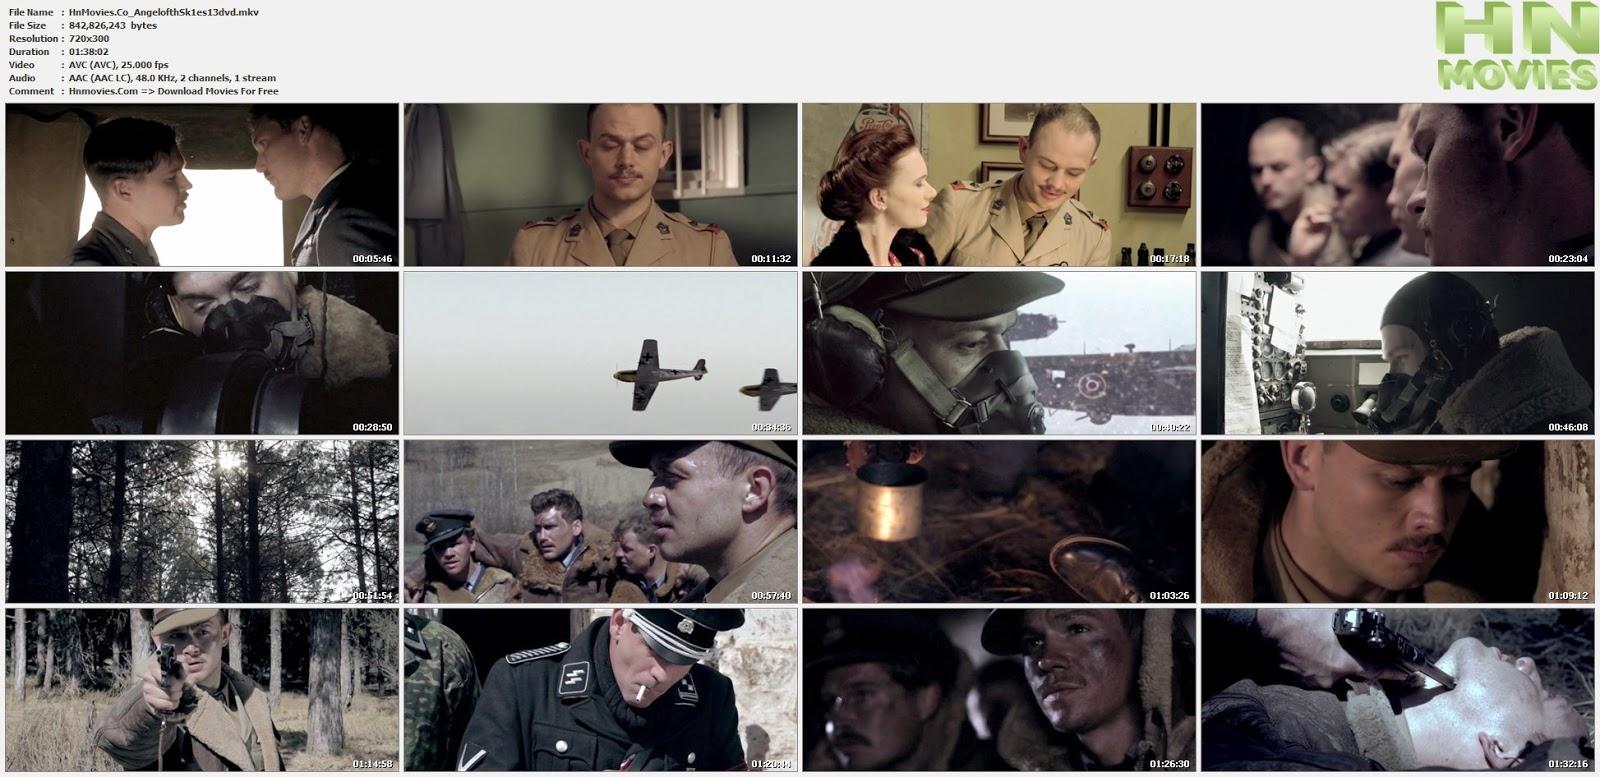 movie screenshot of Angel of the Skies fdmovie.com